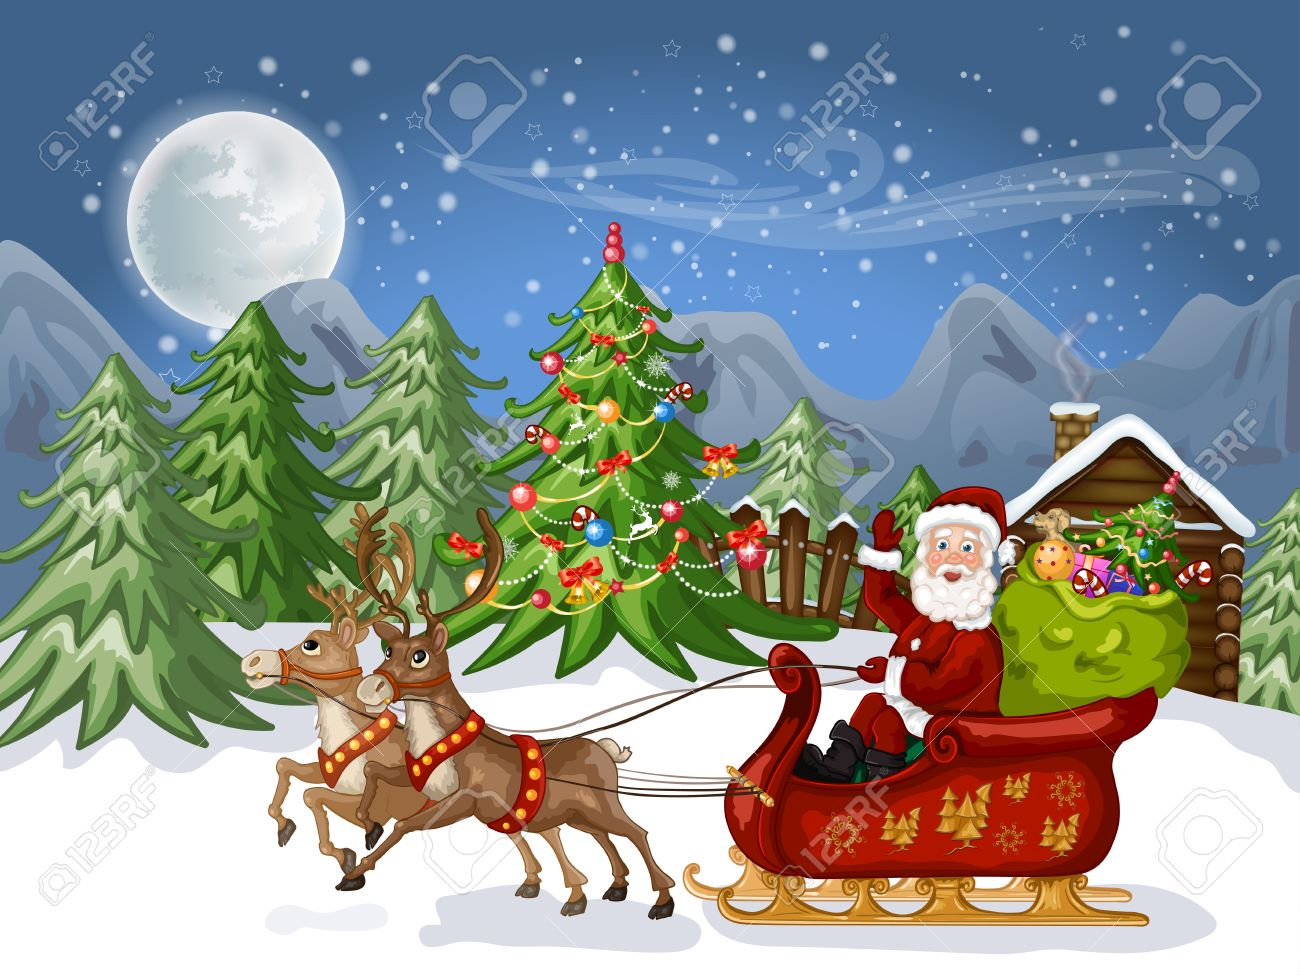 Merry Christmas Card Illustration Of A Funny Cartoon Santa Claus